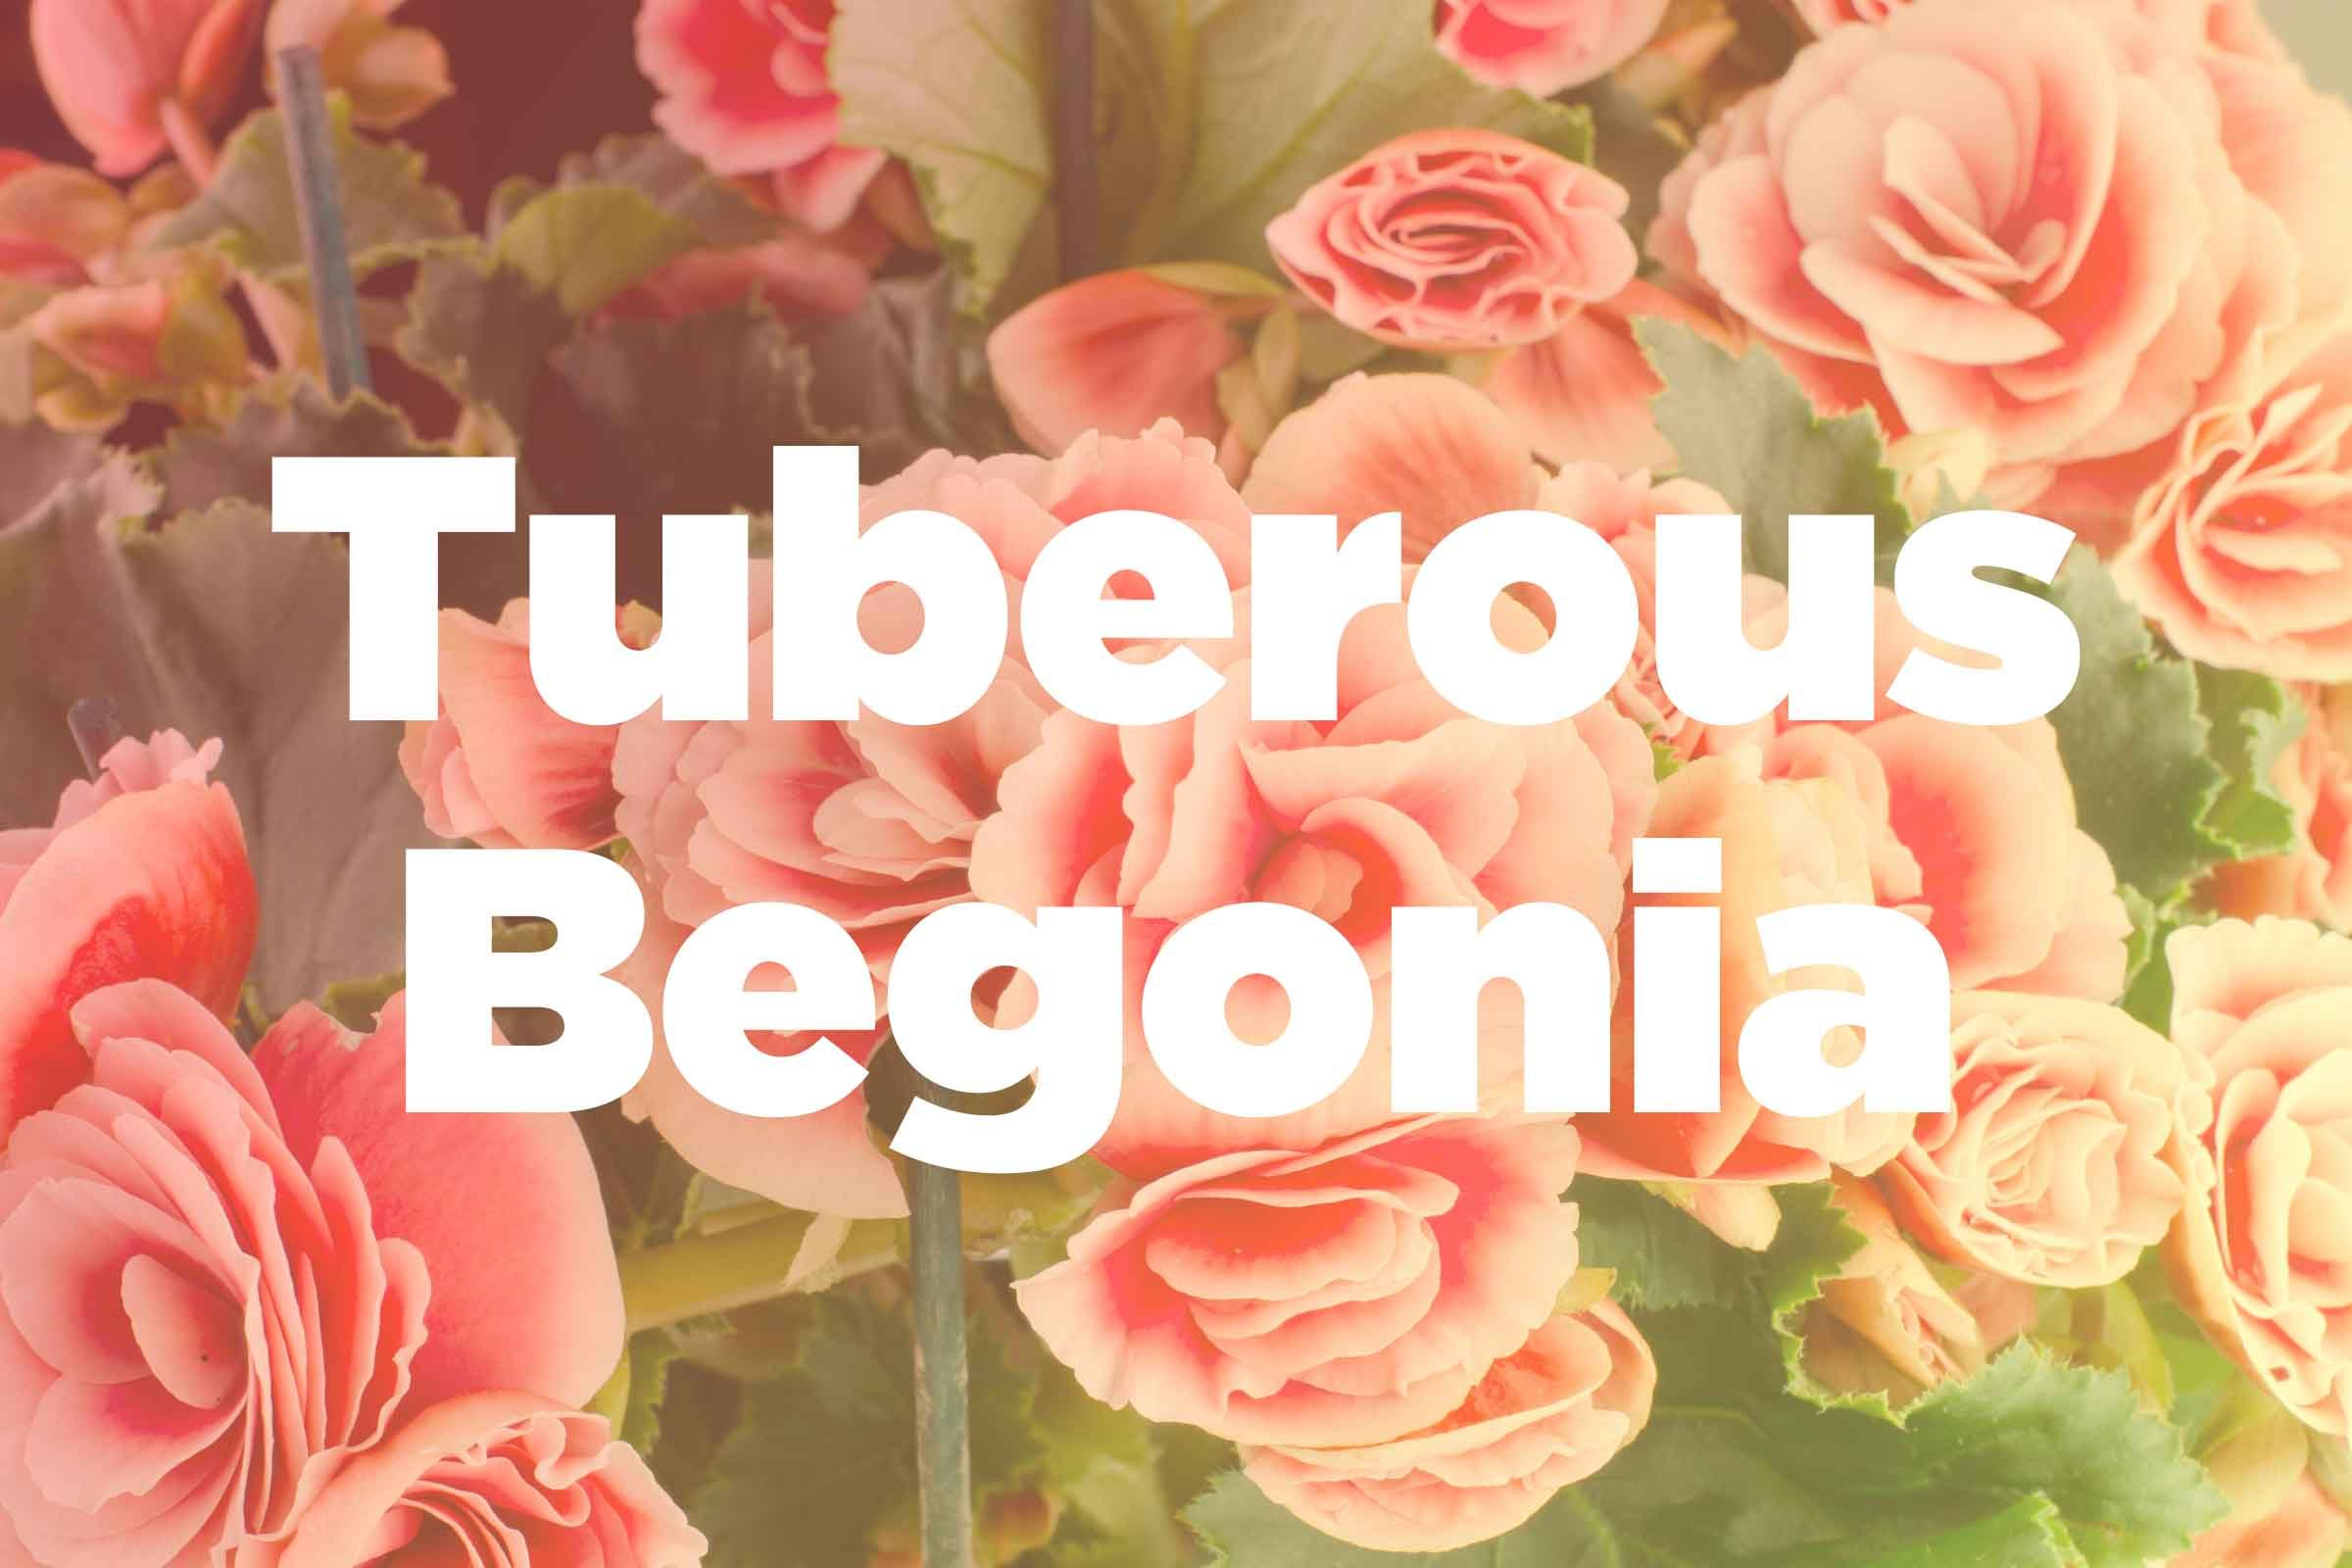 Rous Begonia